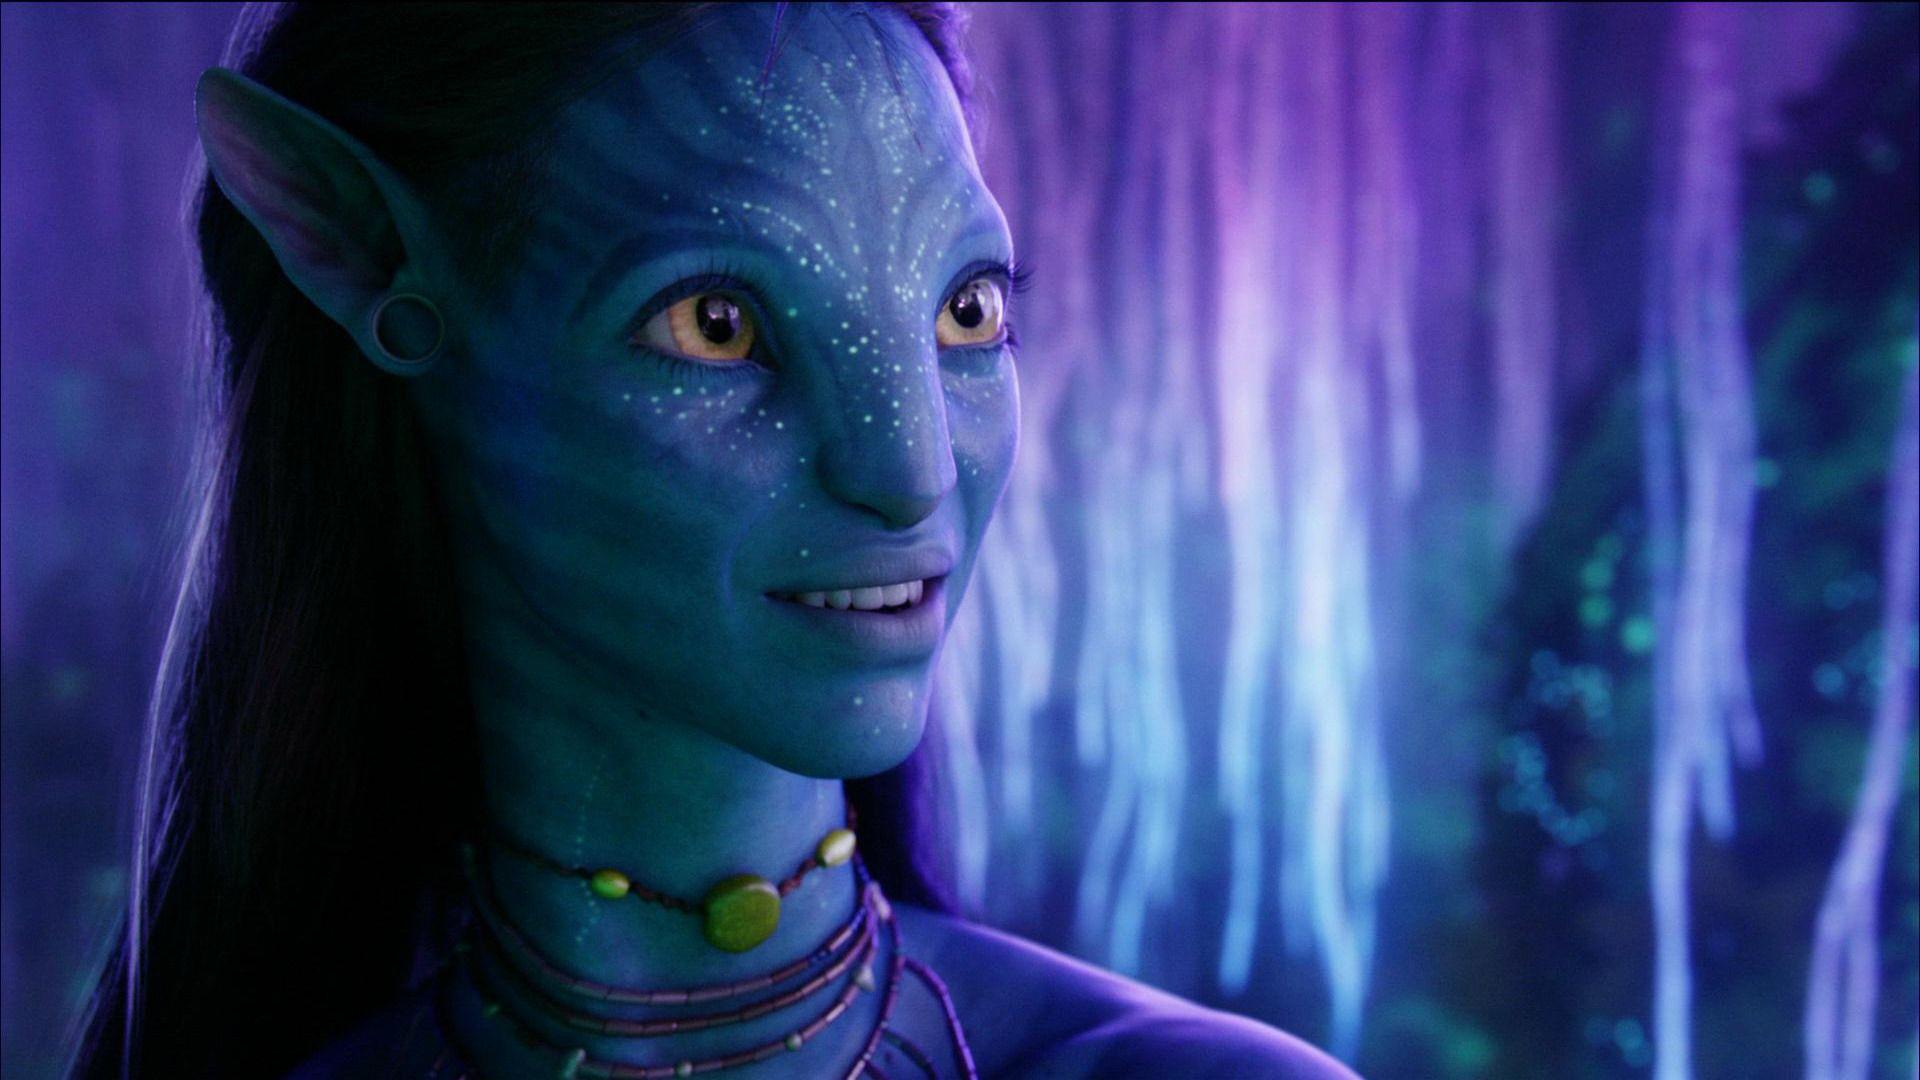 Amazing Wallpaper Movie Avatar 2 - e6389844b5423b65a388ac5034fd2515  Collection_28180.jpg